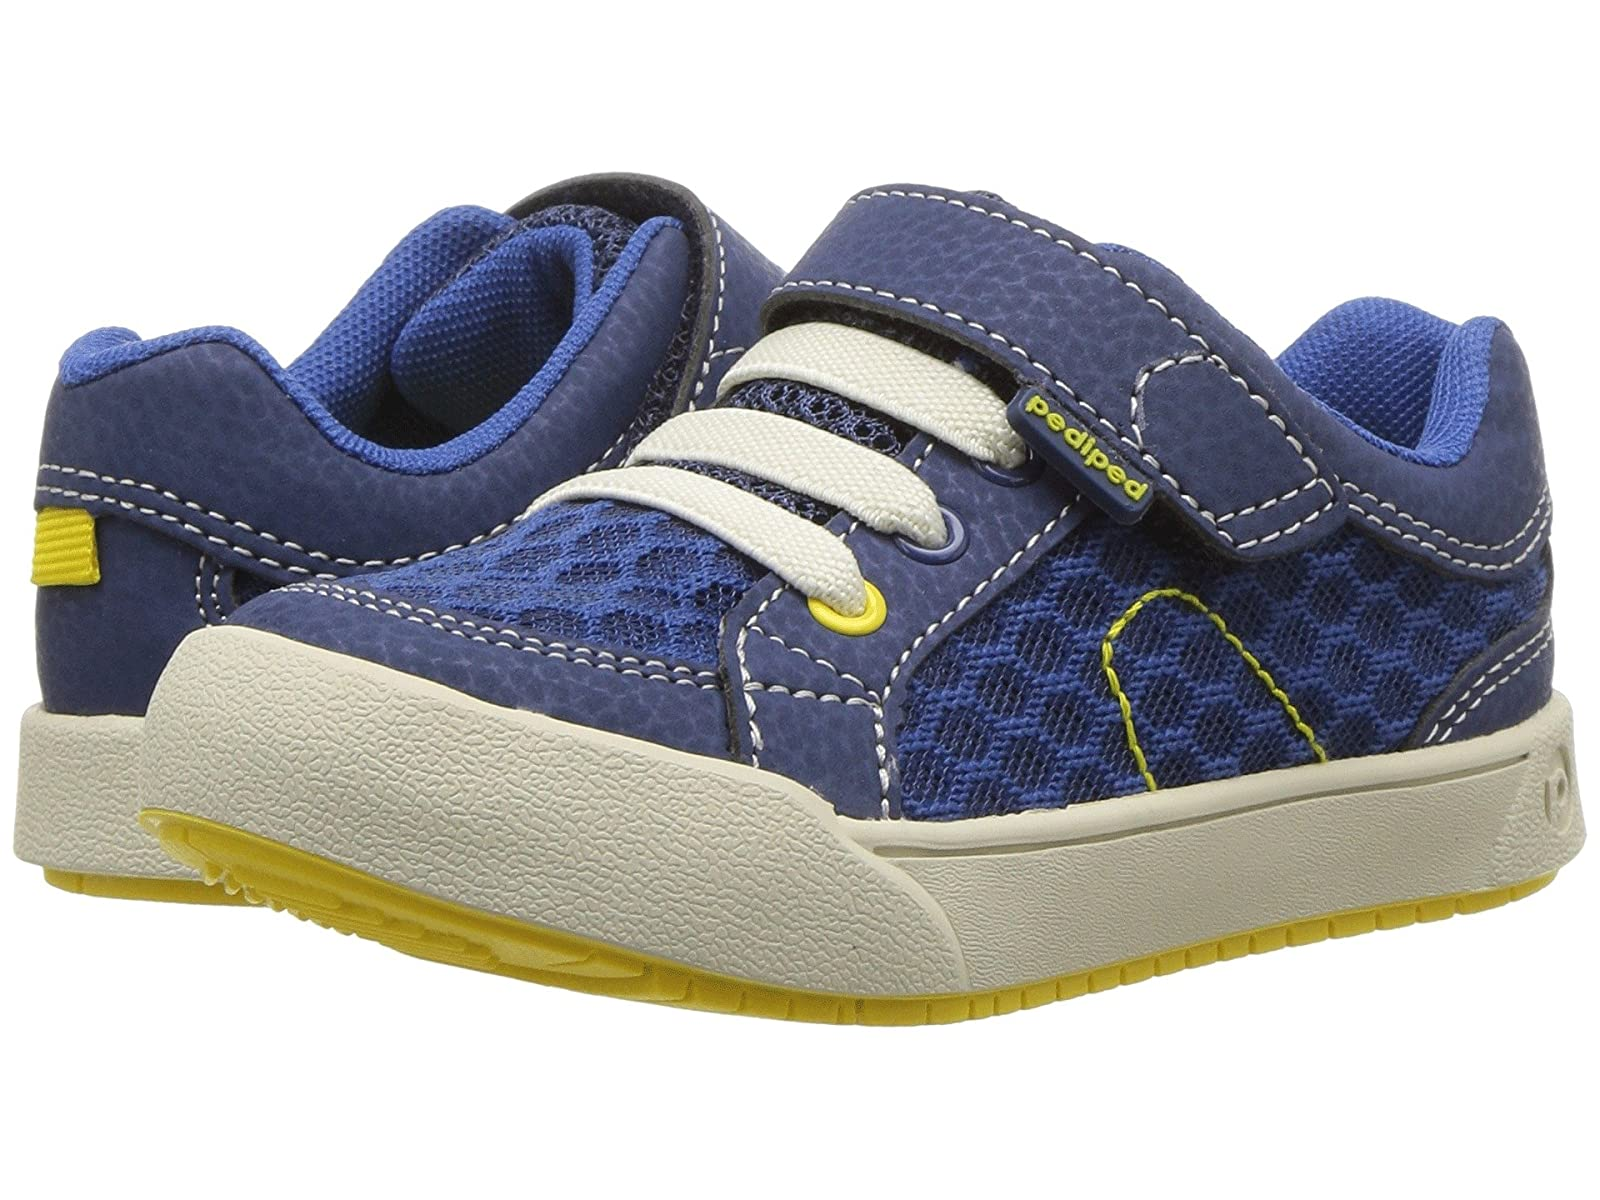 pediped Dani Flex (Toddler/Little Kid)Atmospheric grades have affordable shoes